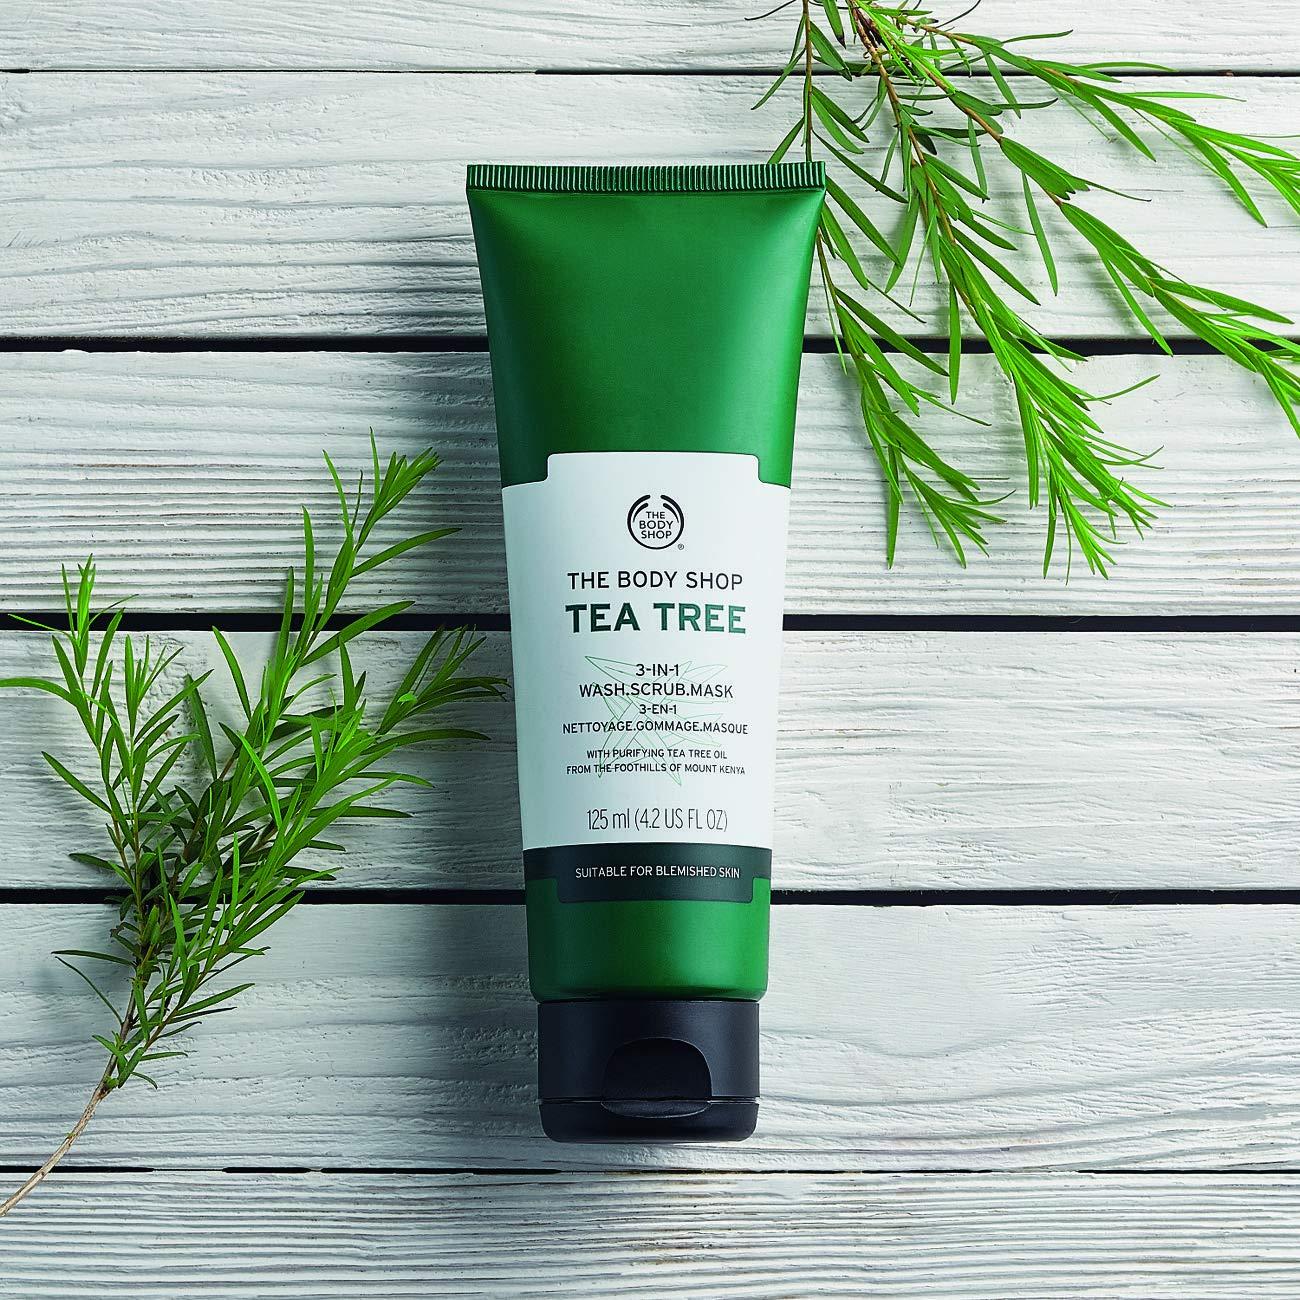 The-Body-Shop-Tea-Tree-Wash-Scrub-Mask